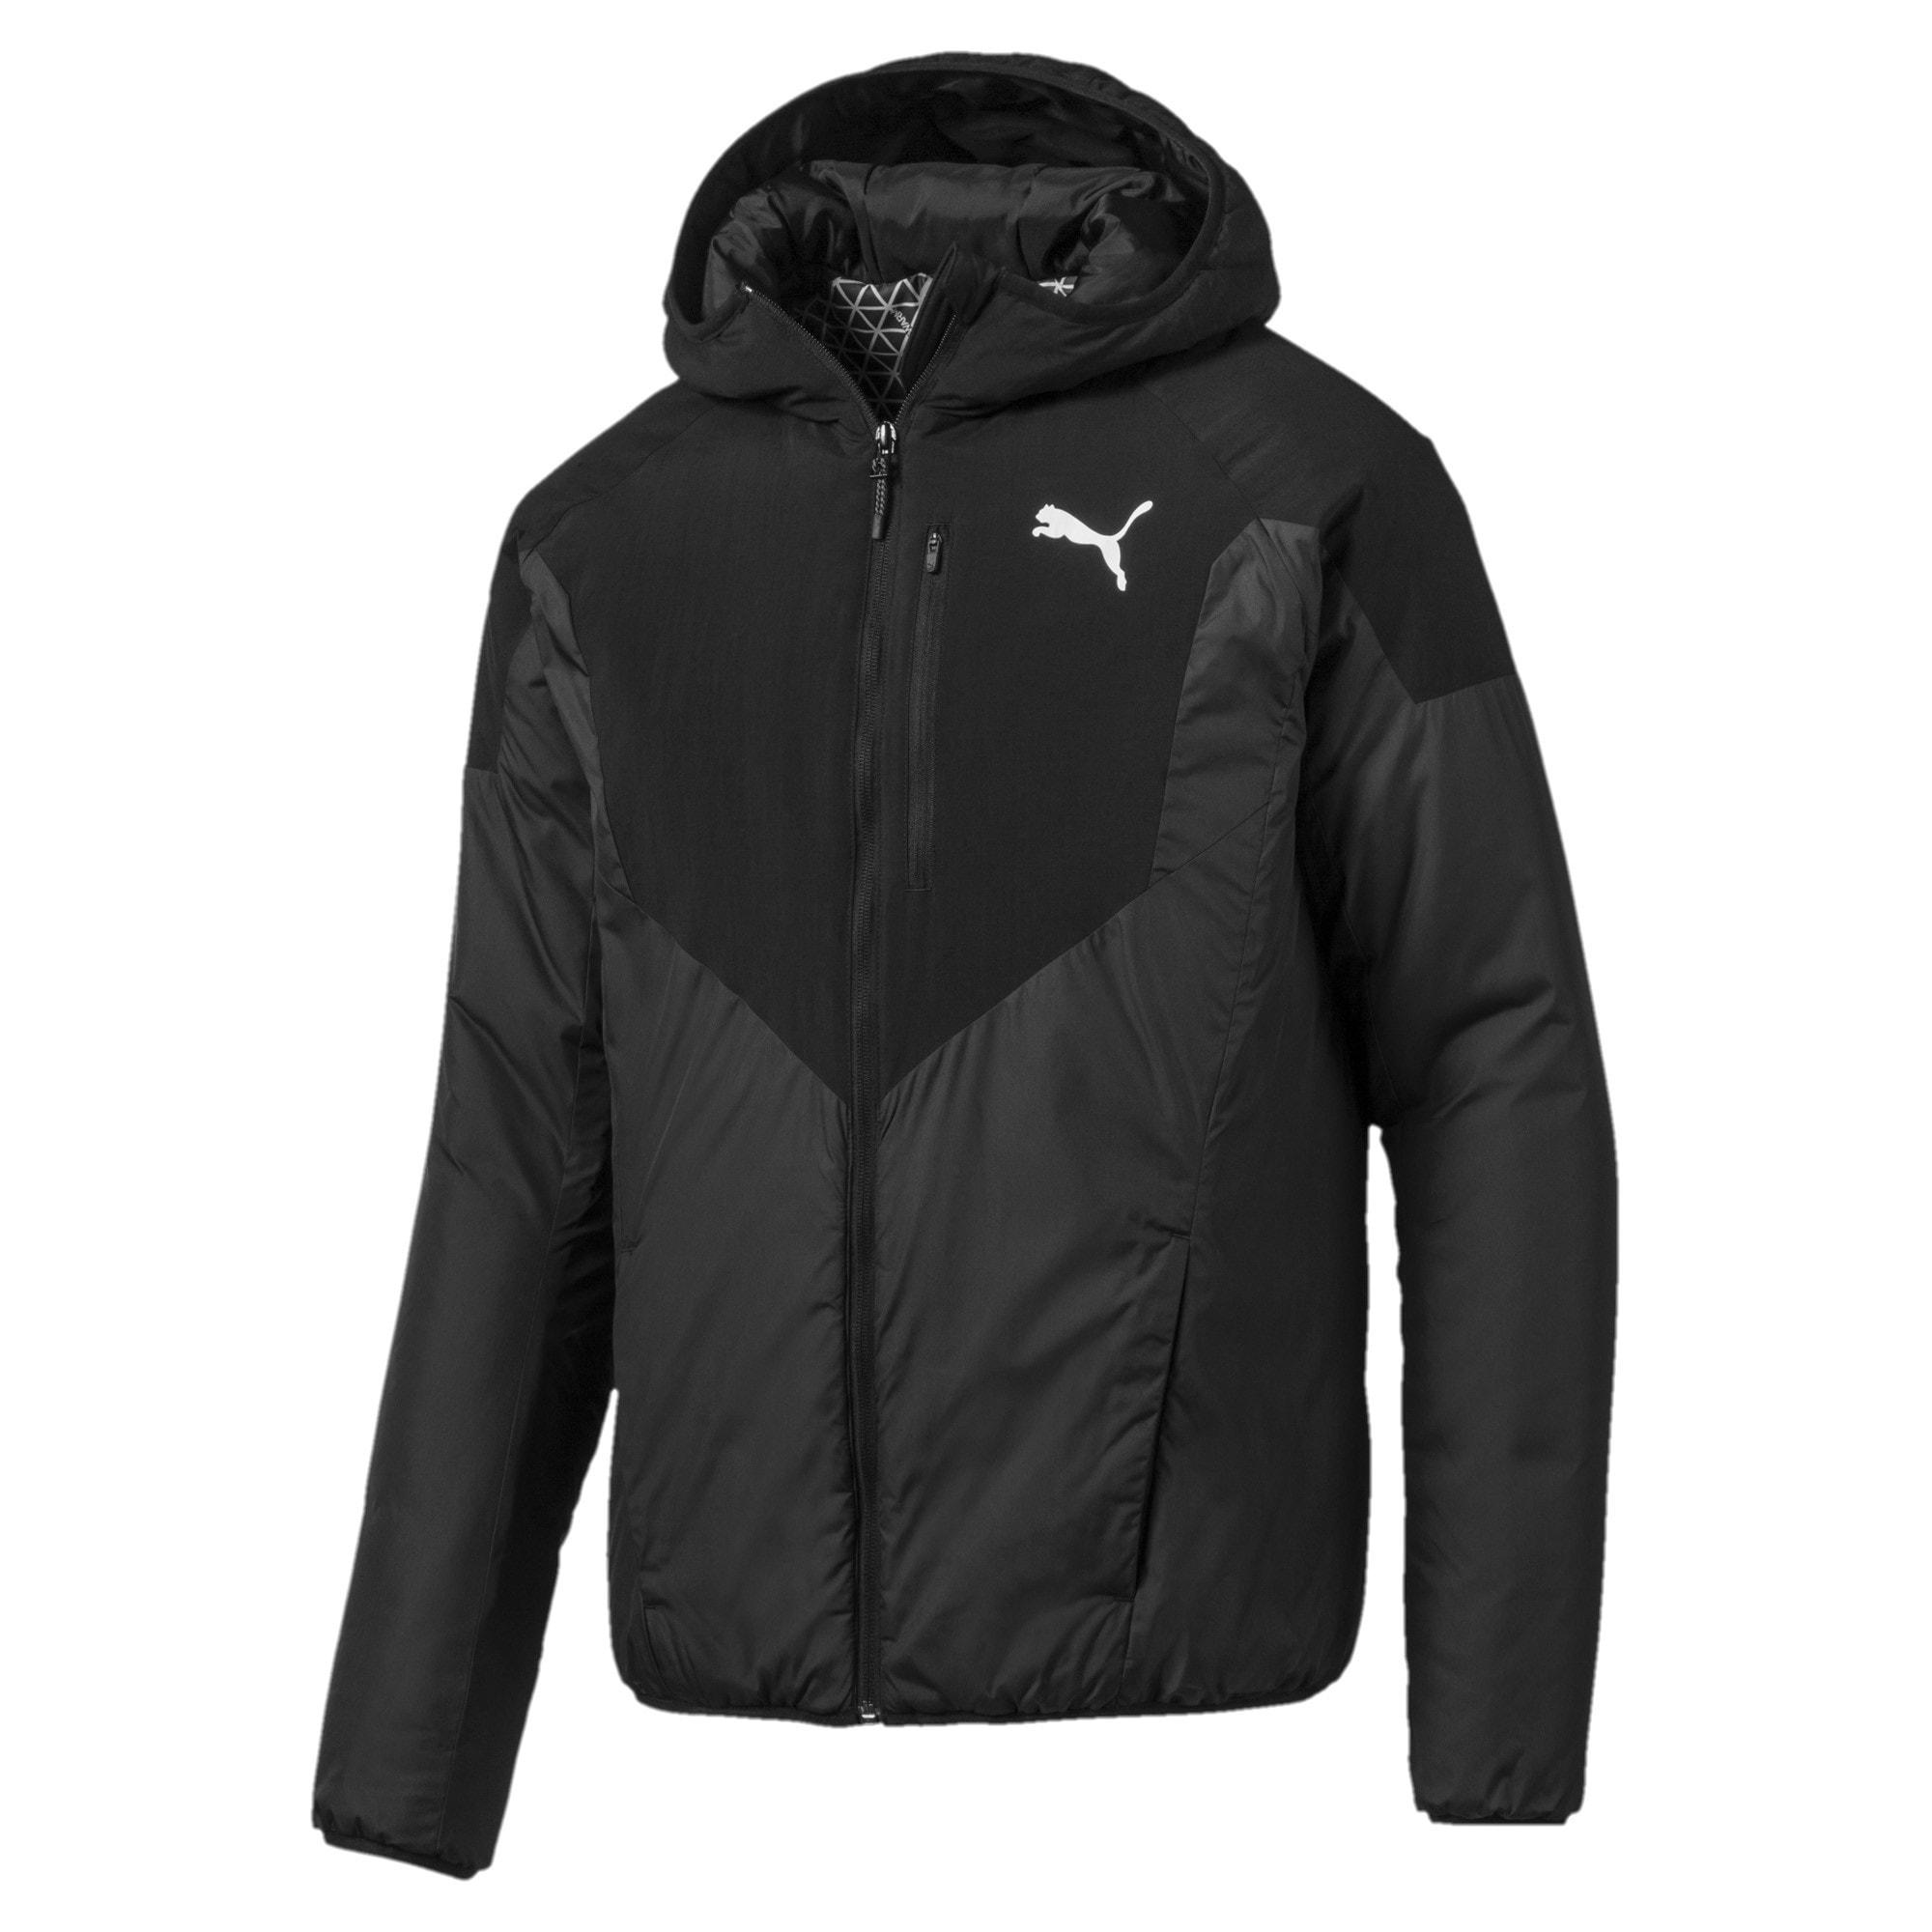 Thumbnail 1 of PWRWarm Padded Men's Jacket, Puma Black, medium-IND